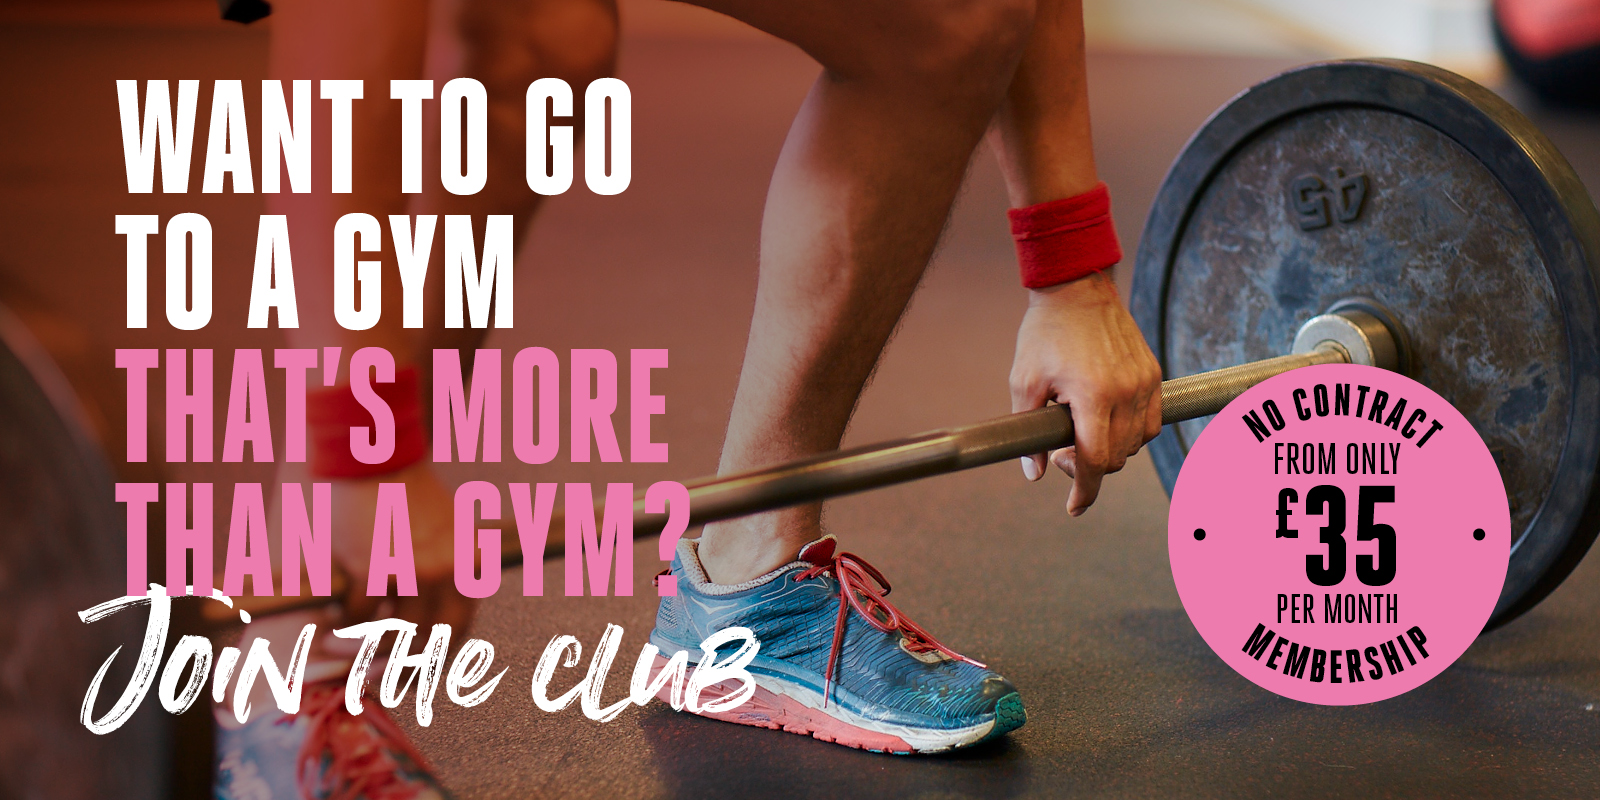 Marriott Club offers Gym Facilities